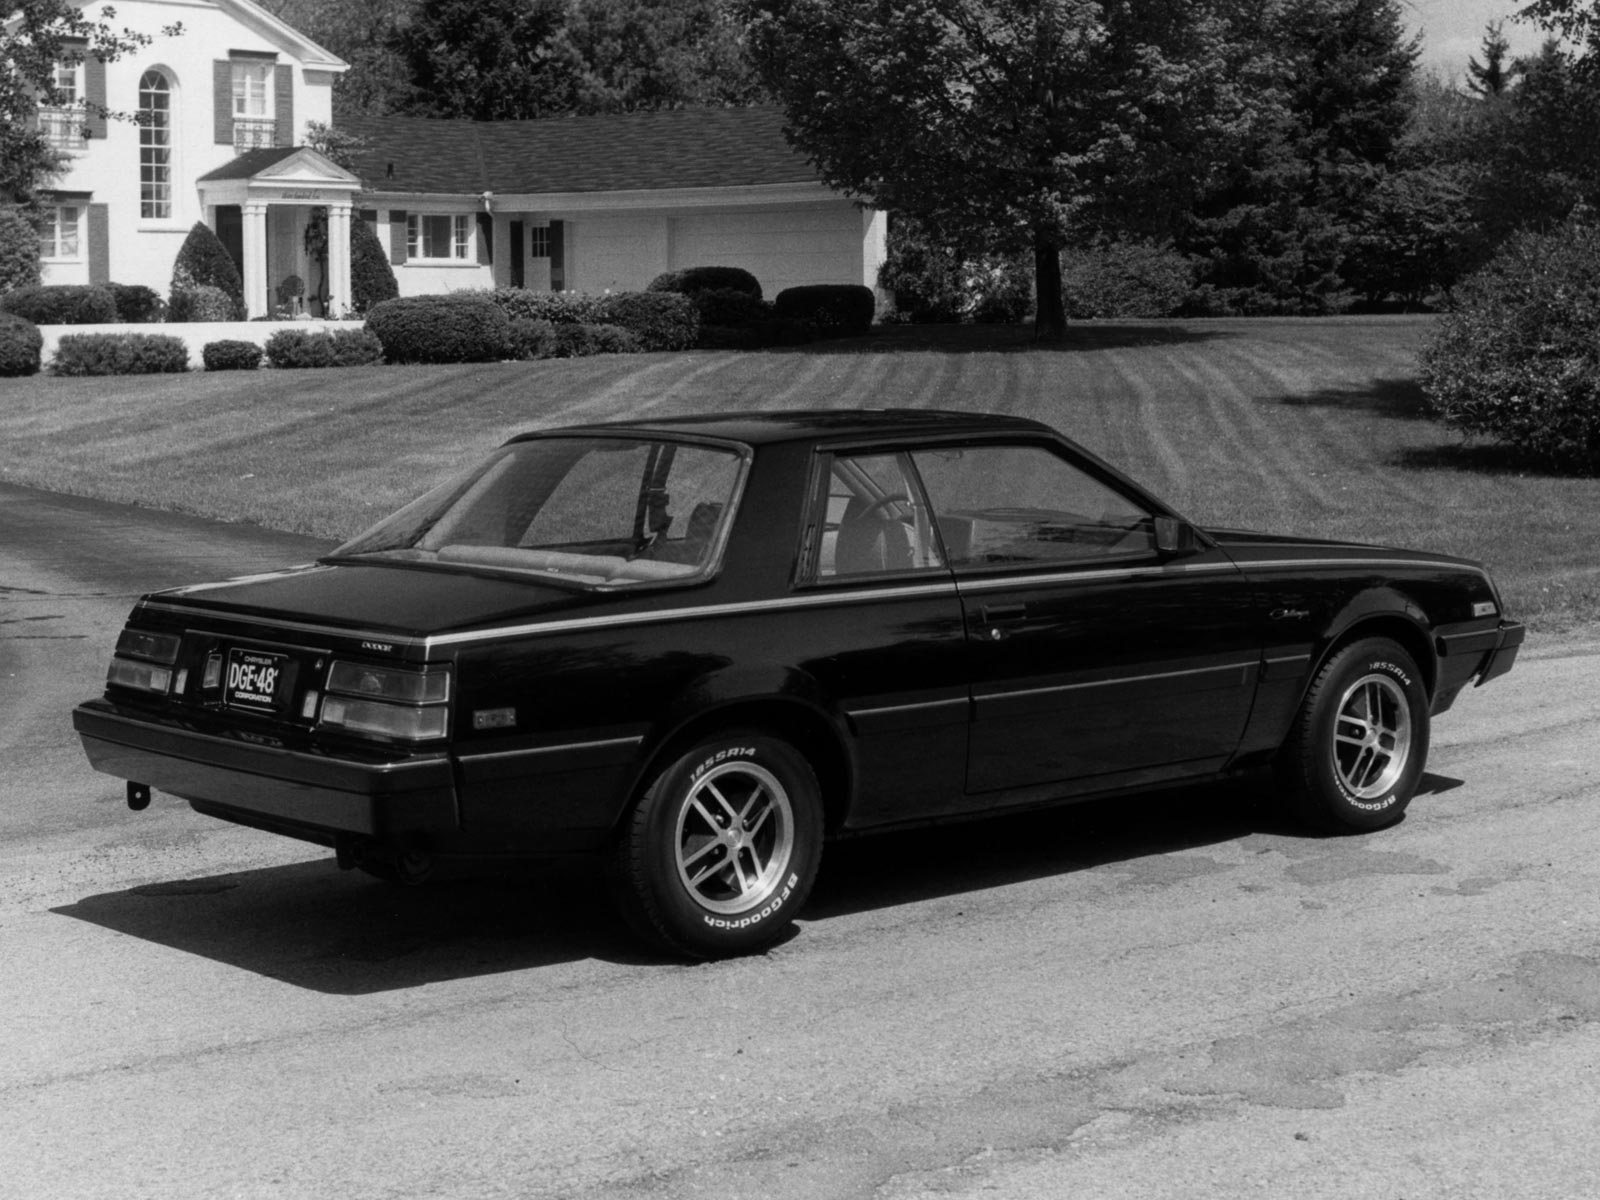 1978 1983: